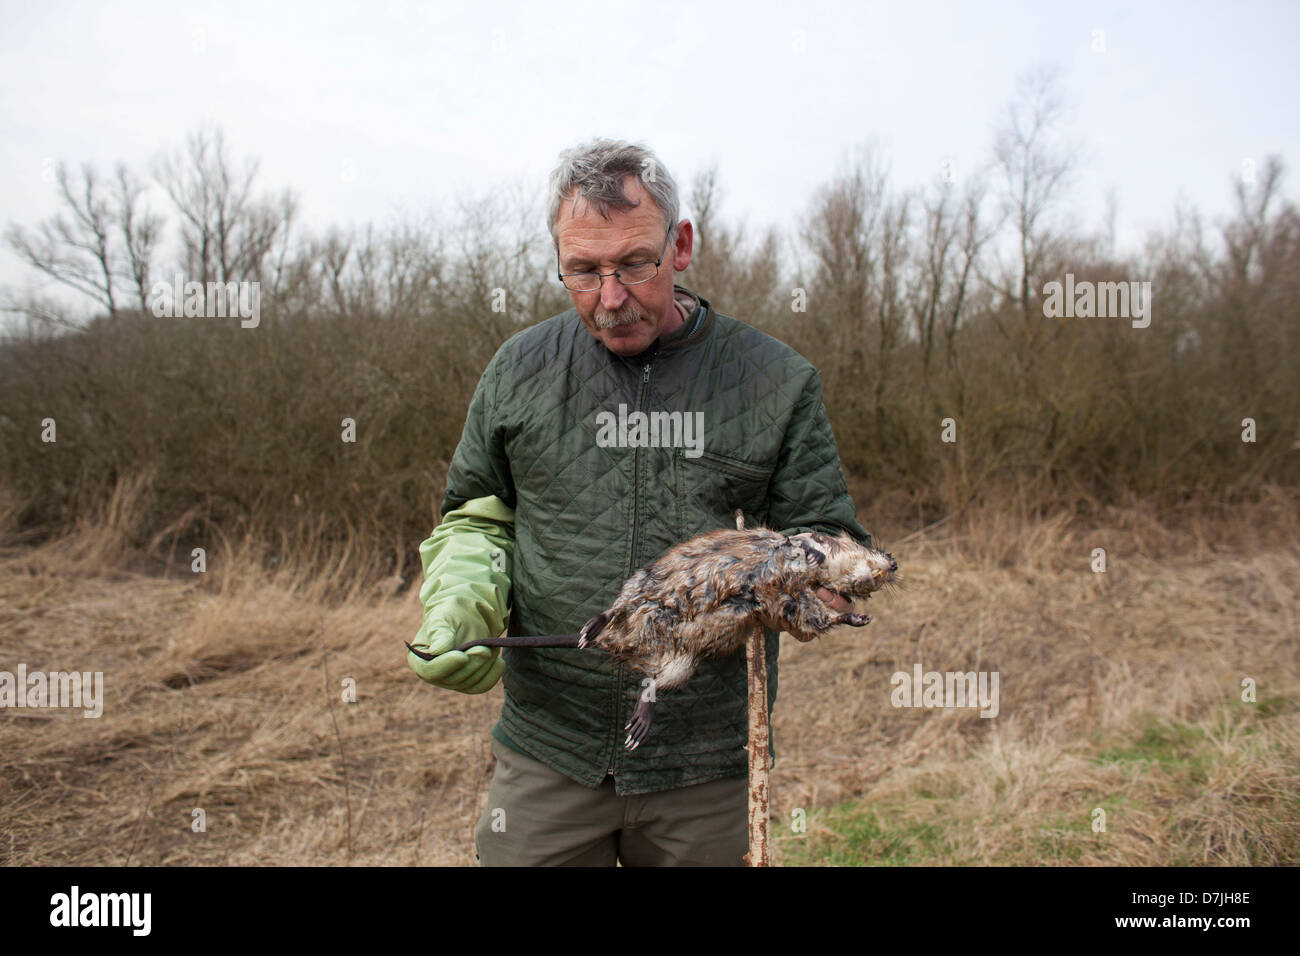 Dutch rat catcher in natural reserve. - Stock Image